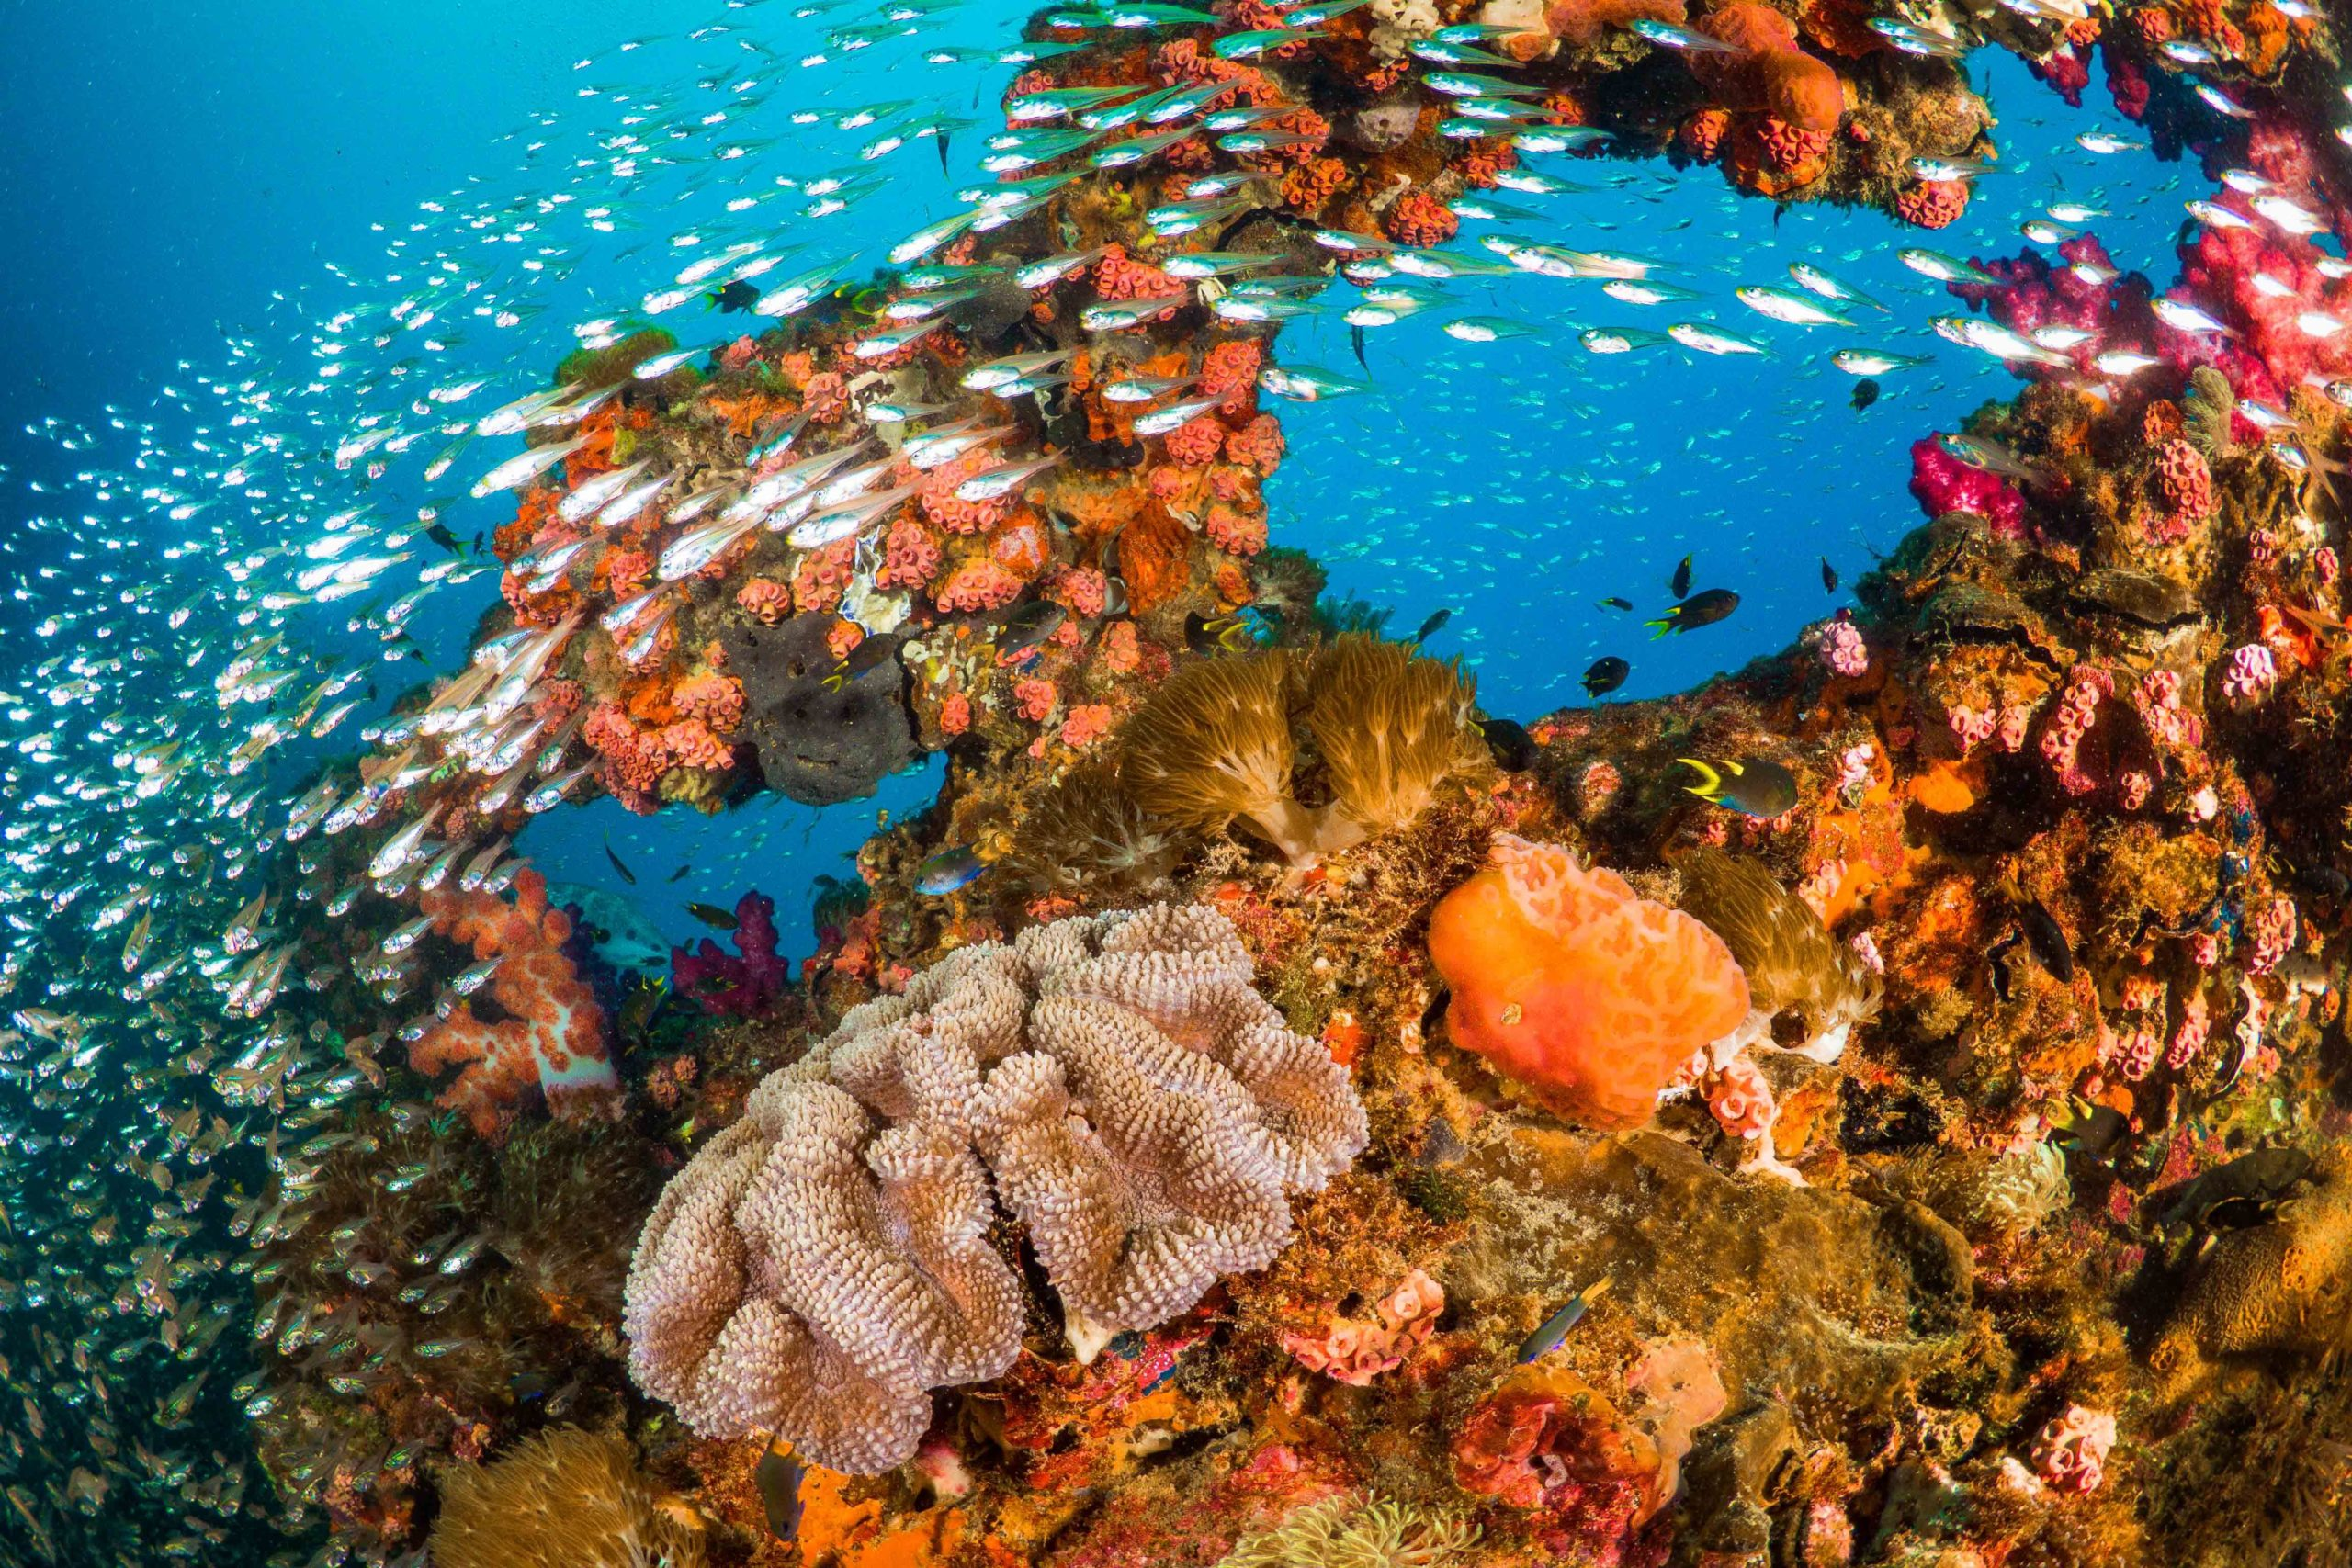 A shoal of fish swim past a vibrant artificial reef.